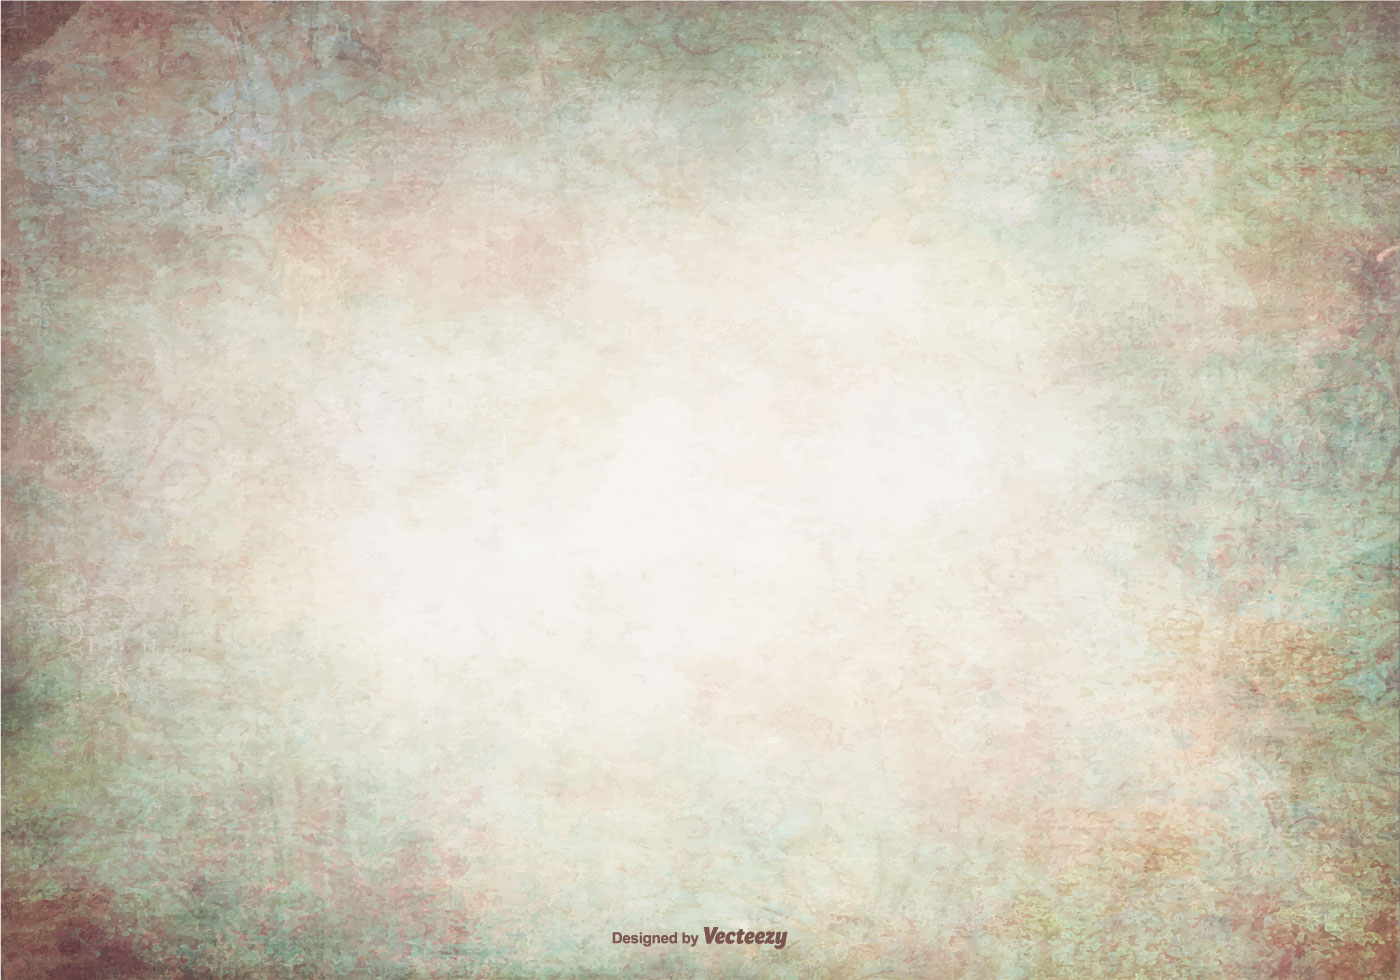 Vintage Grunge Texture - Download Free Vector Art, Stock ...